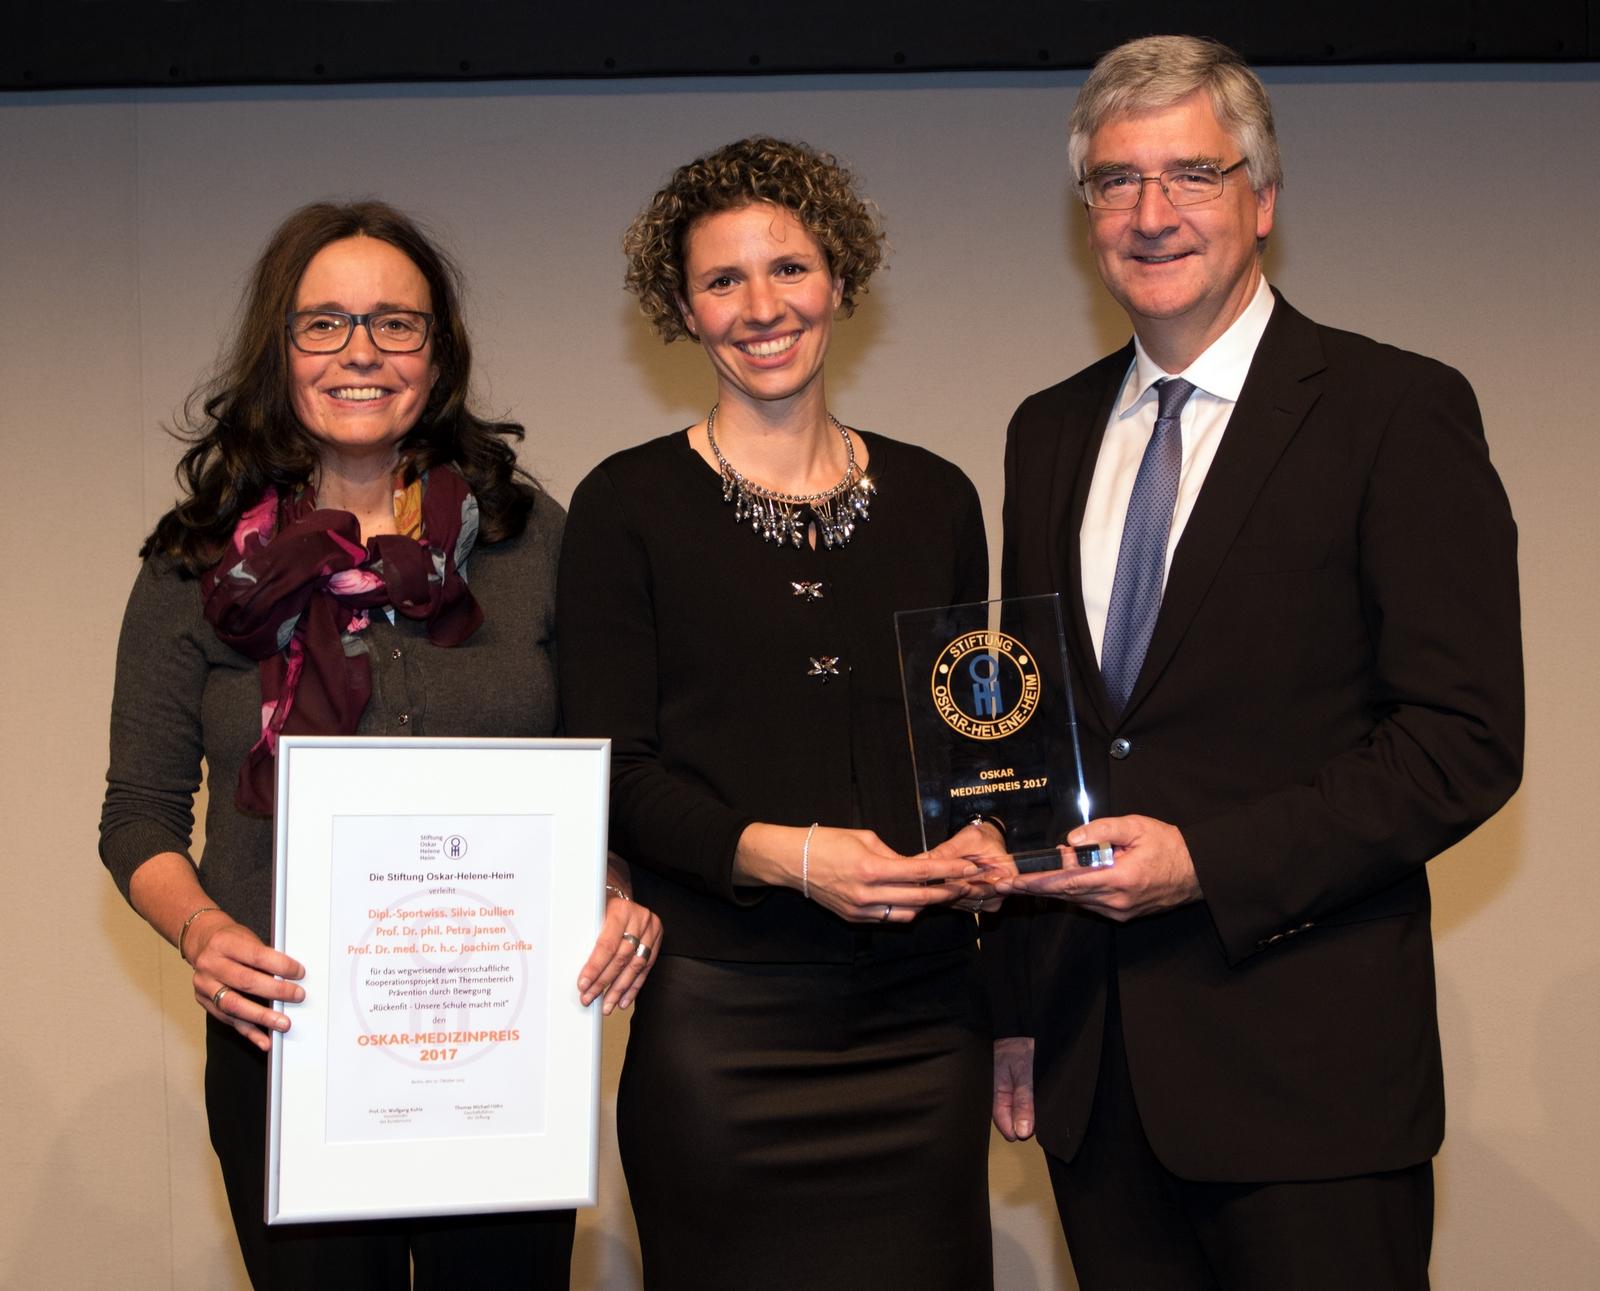 Preisträger OSKAR Medizinpreis 2017 [Quelle Jan Evers] für Pressemailer